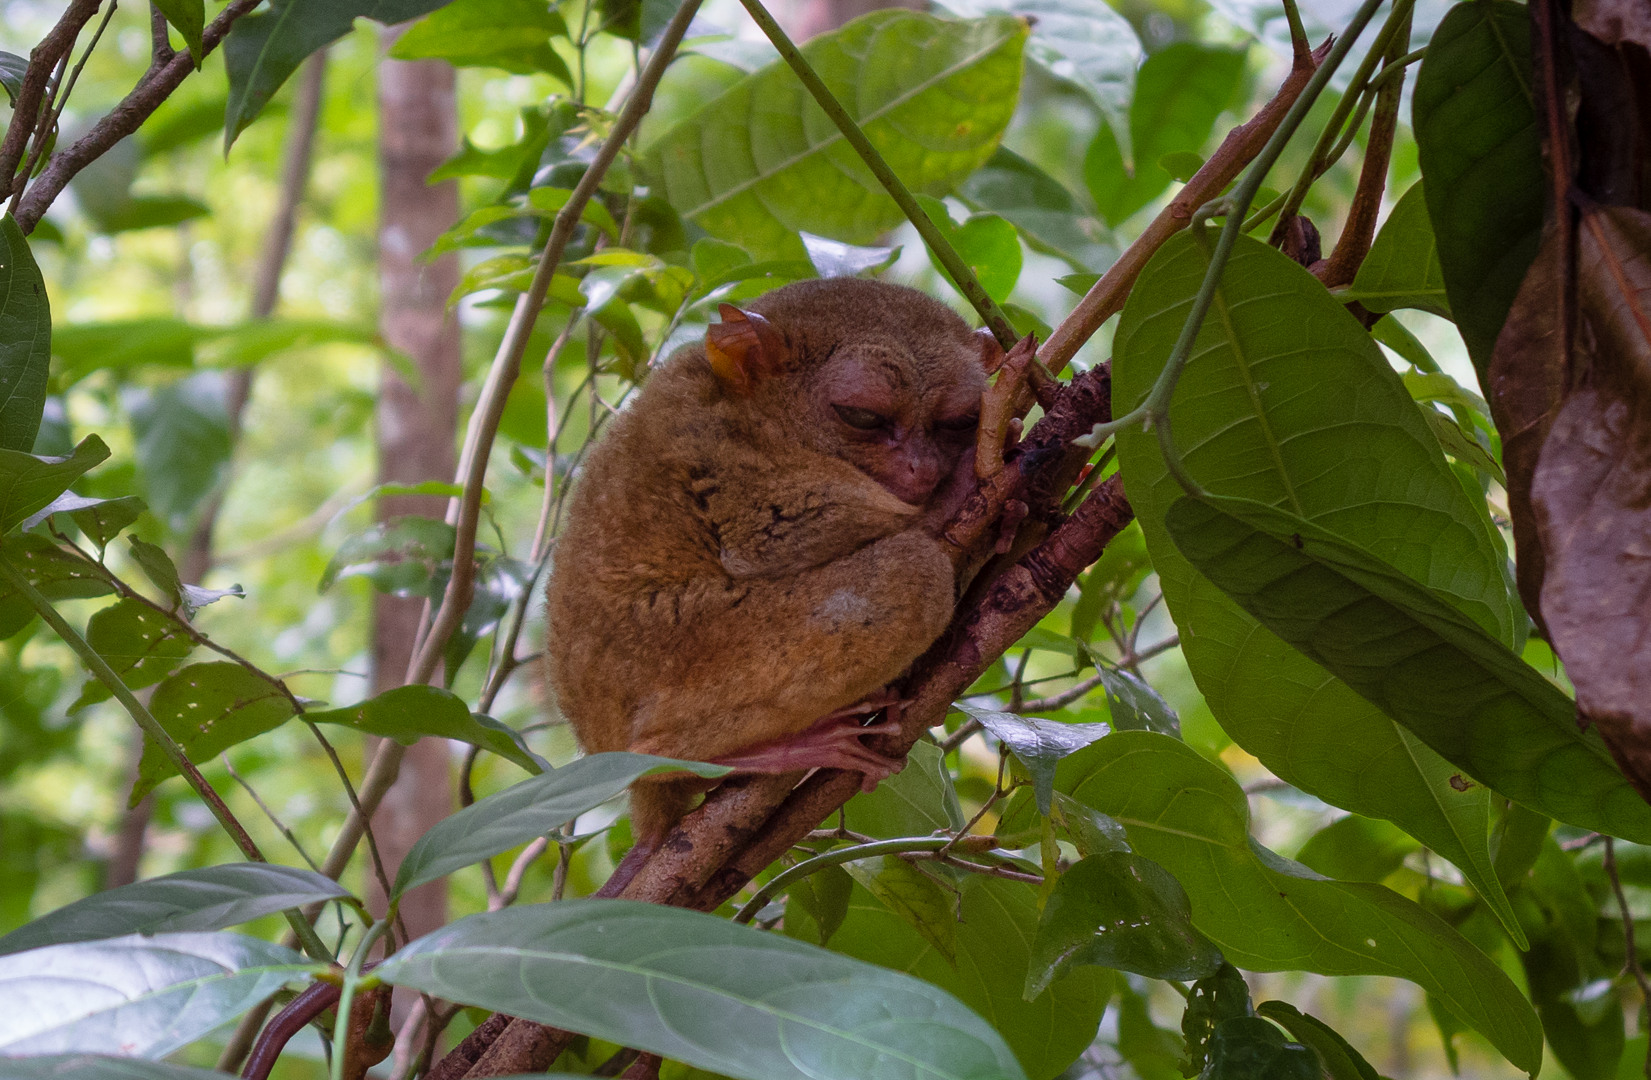 Долгопят Philippine tarsier (Carlito syrichta)о. Бохол